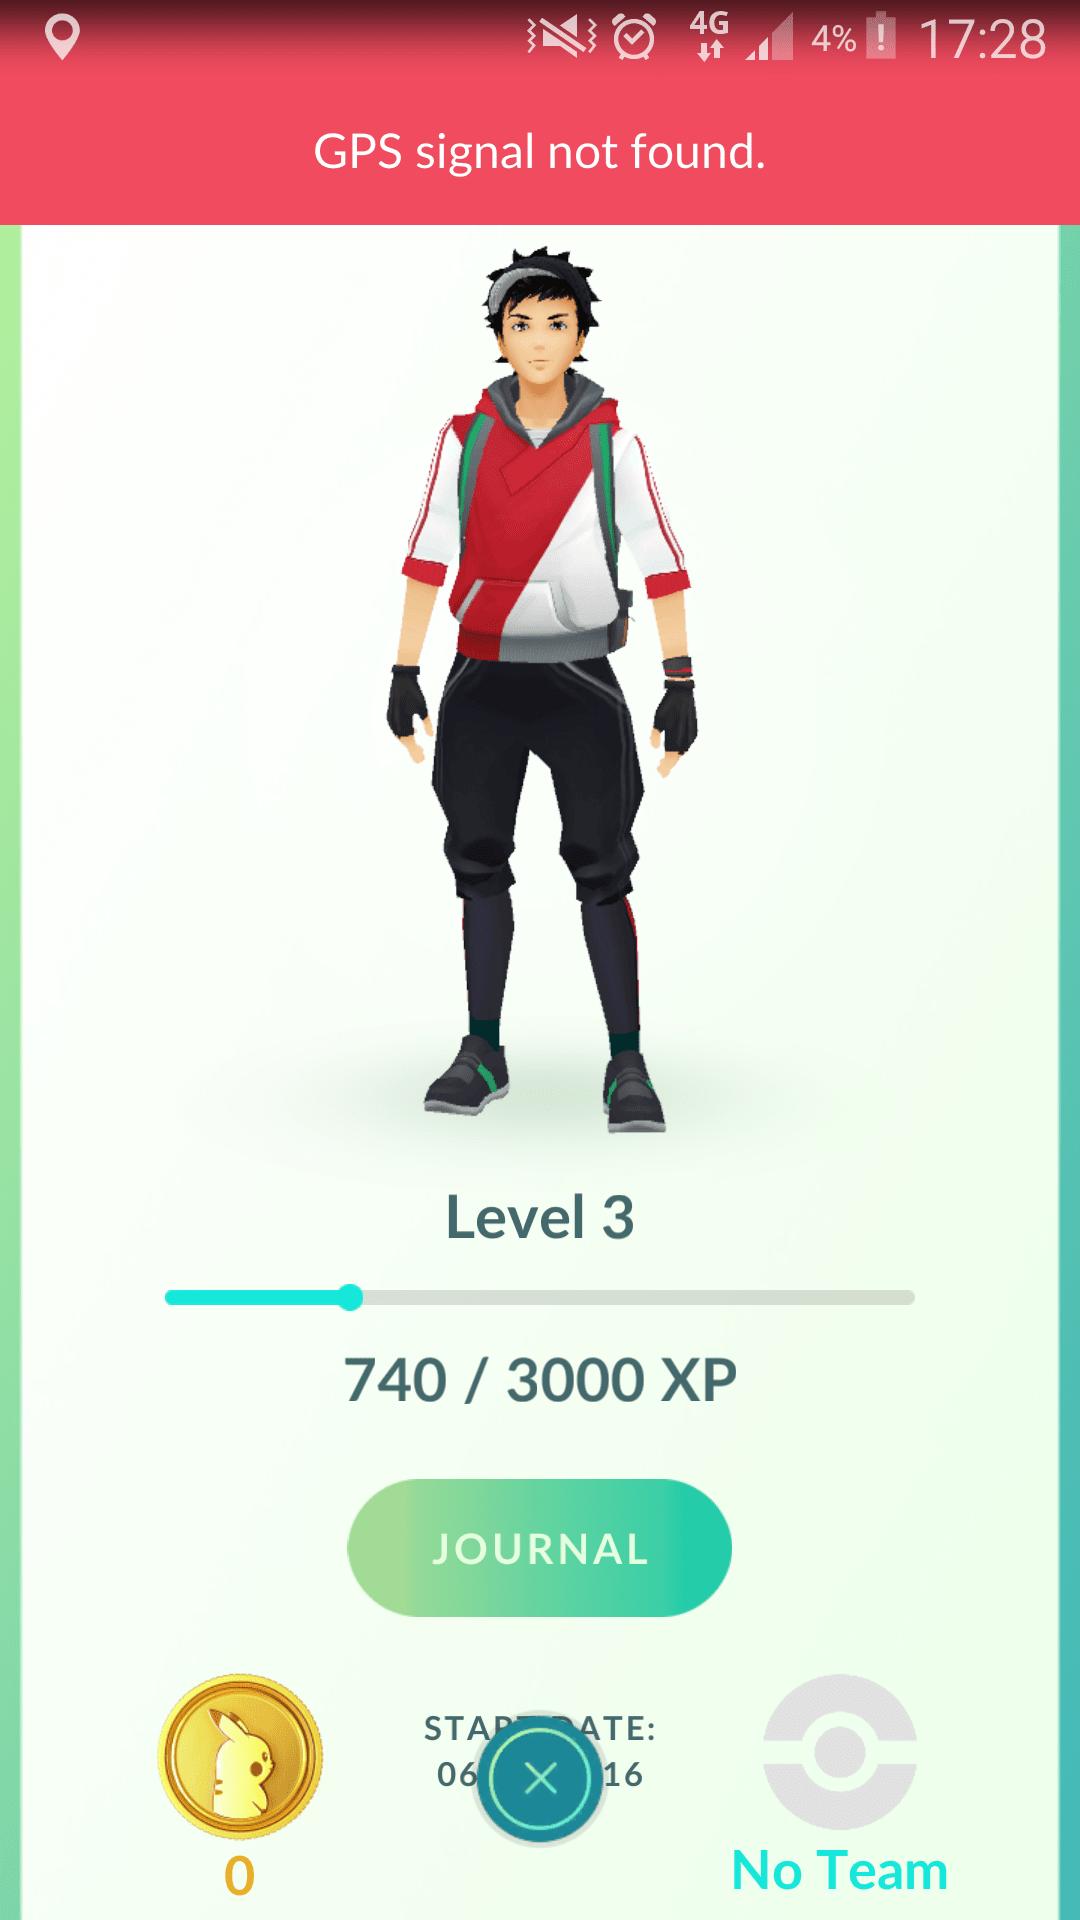 Pokemon Go User Profile Image